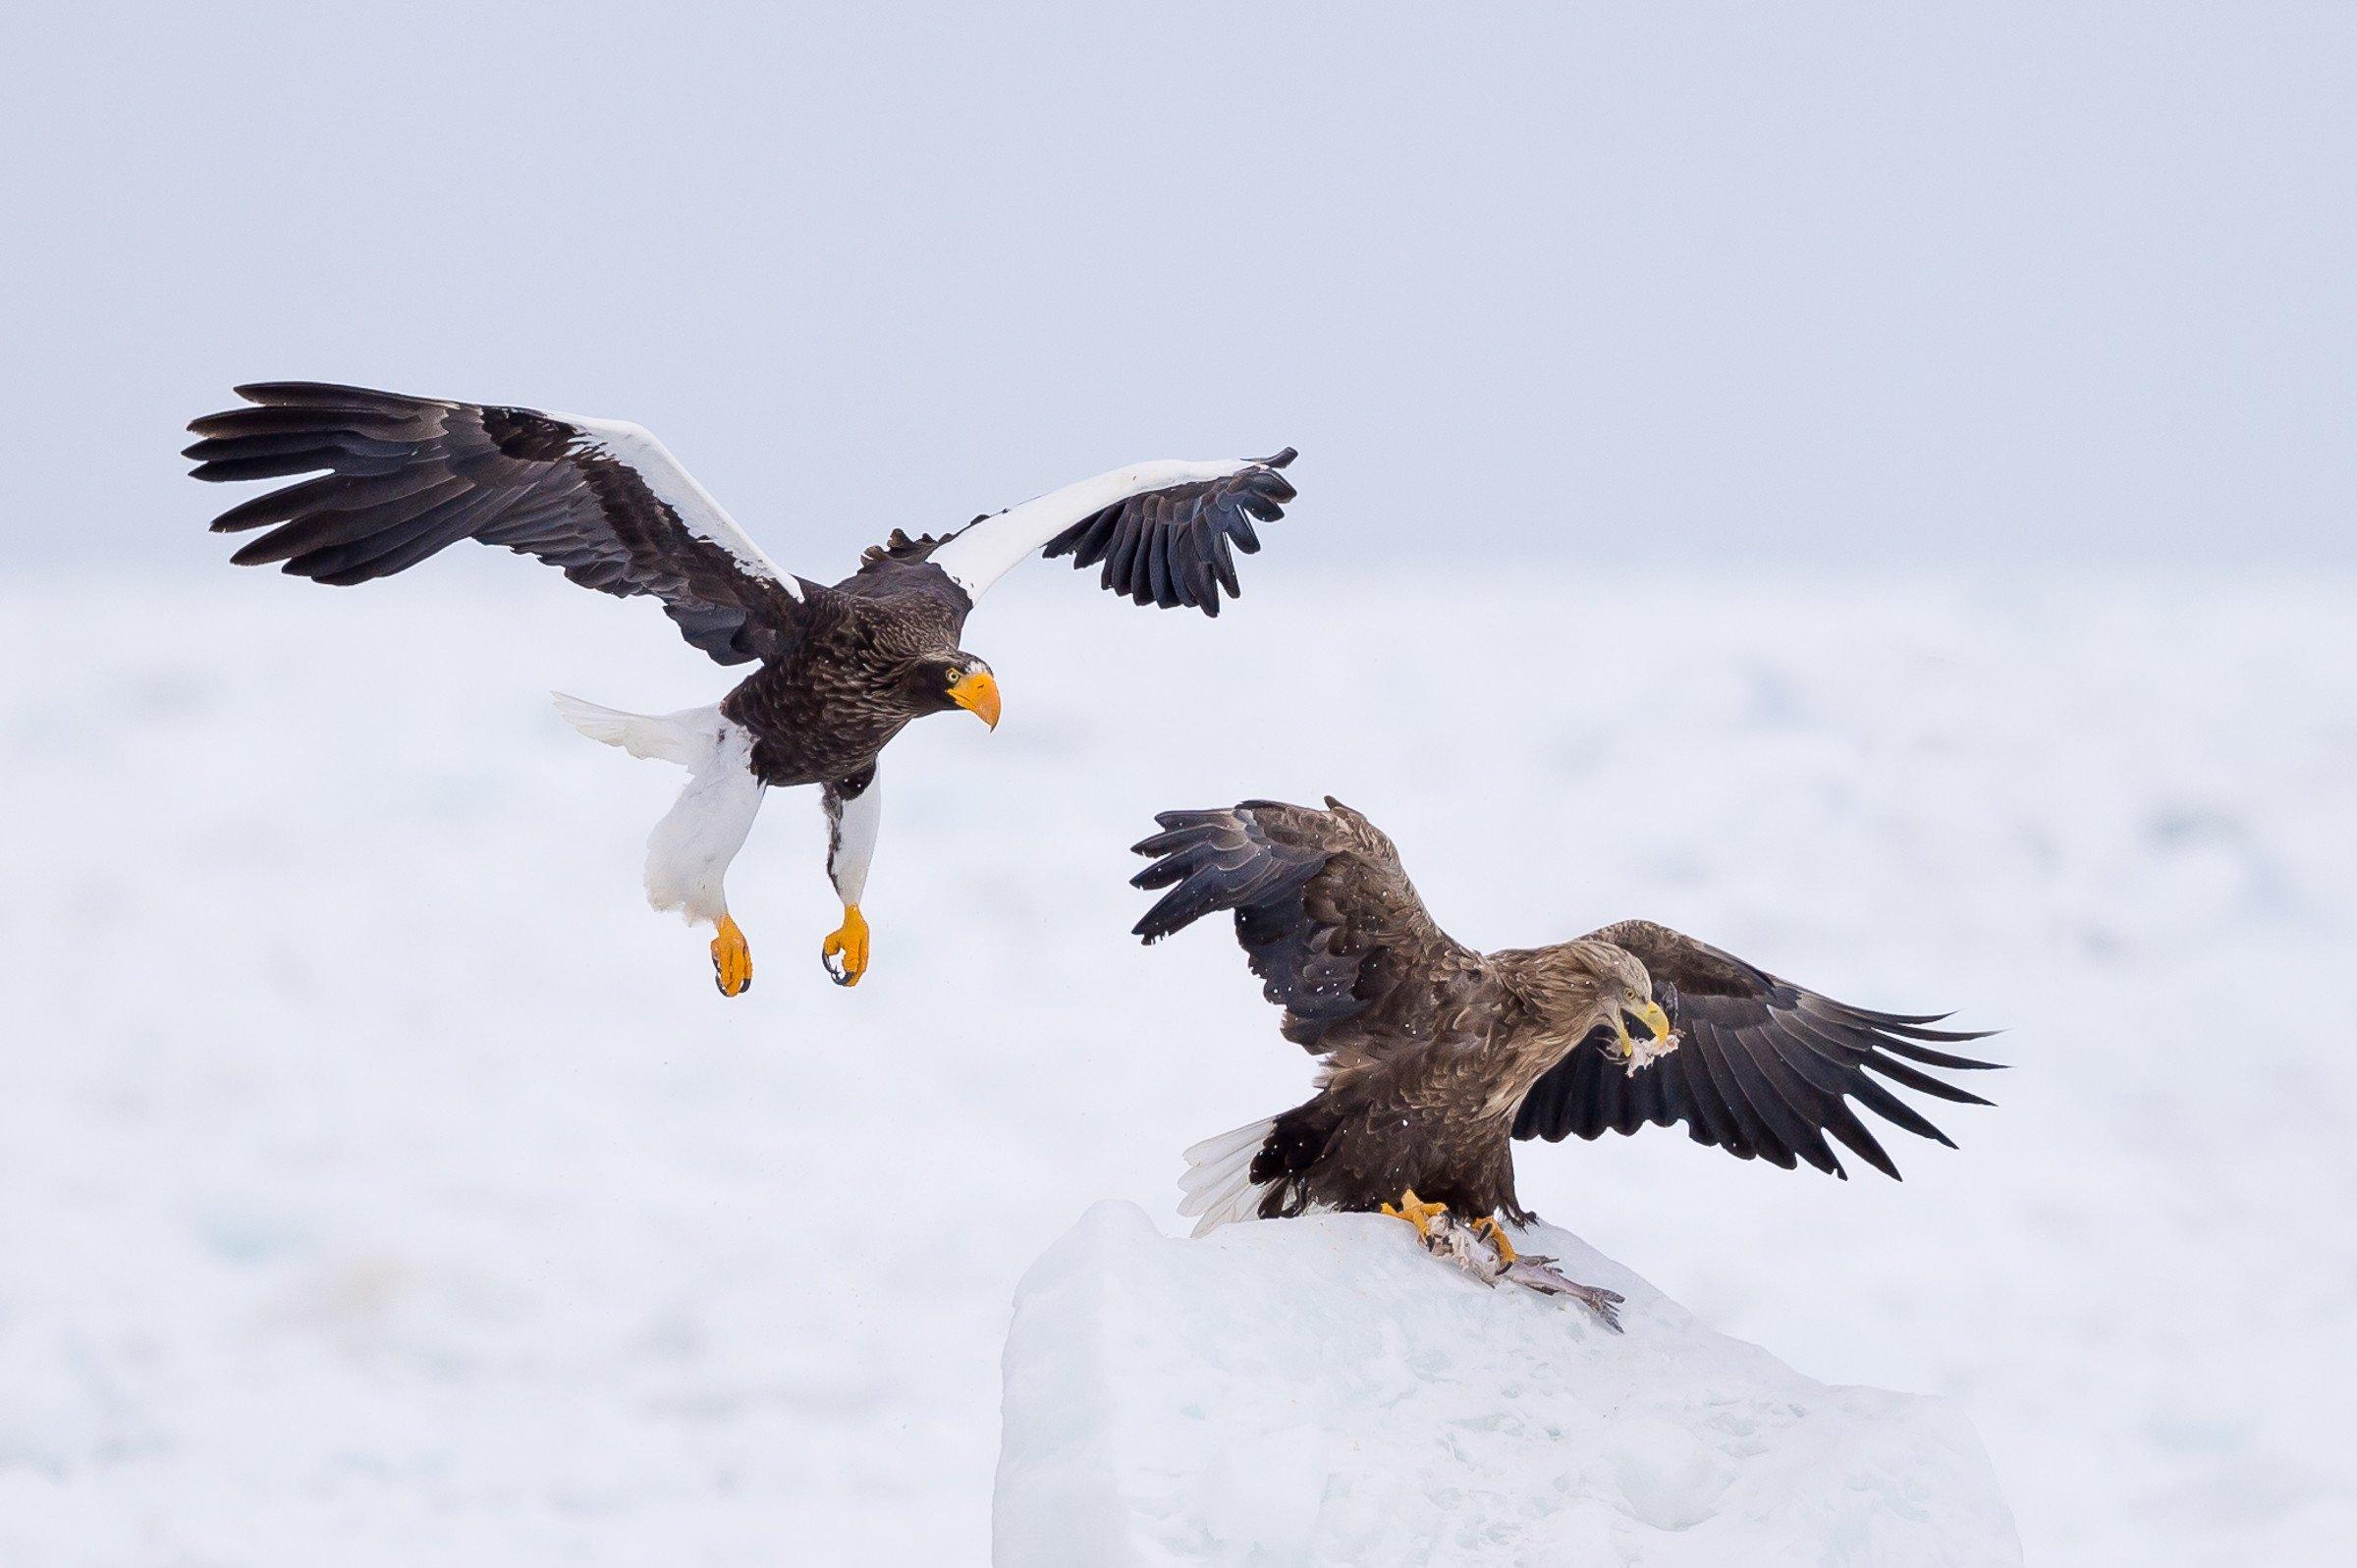 roofvogel arend 1727